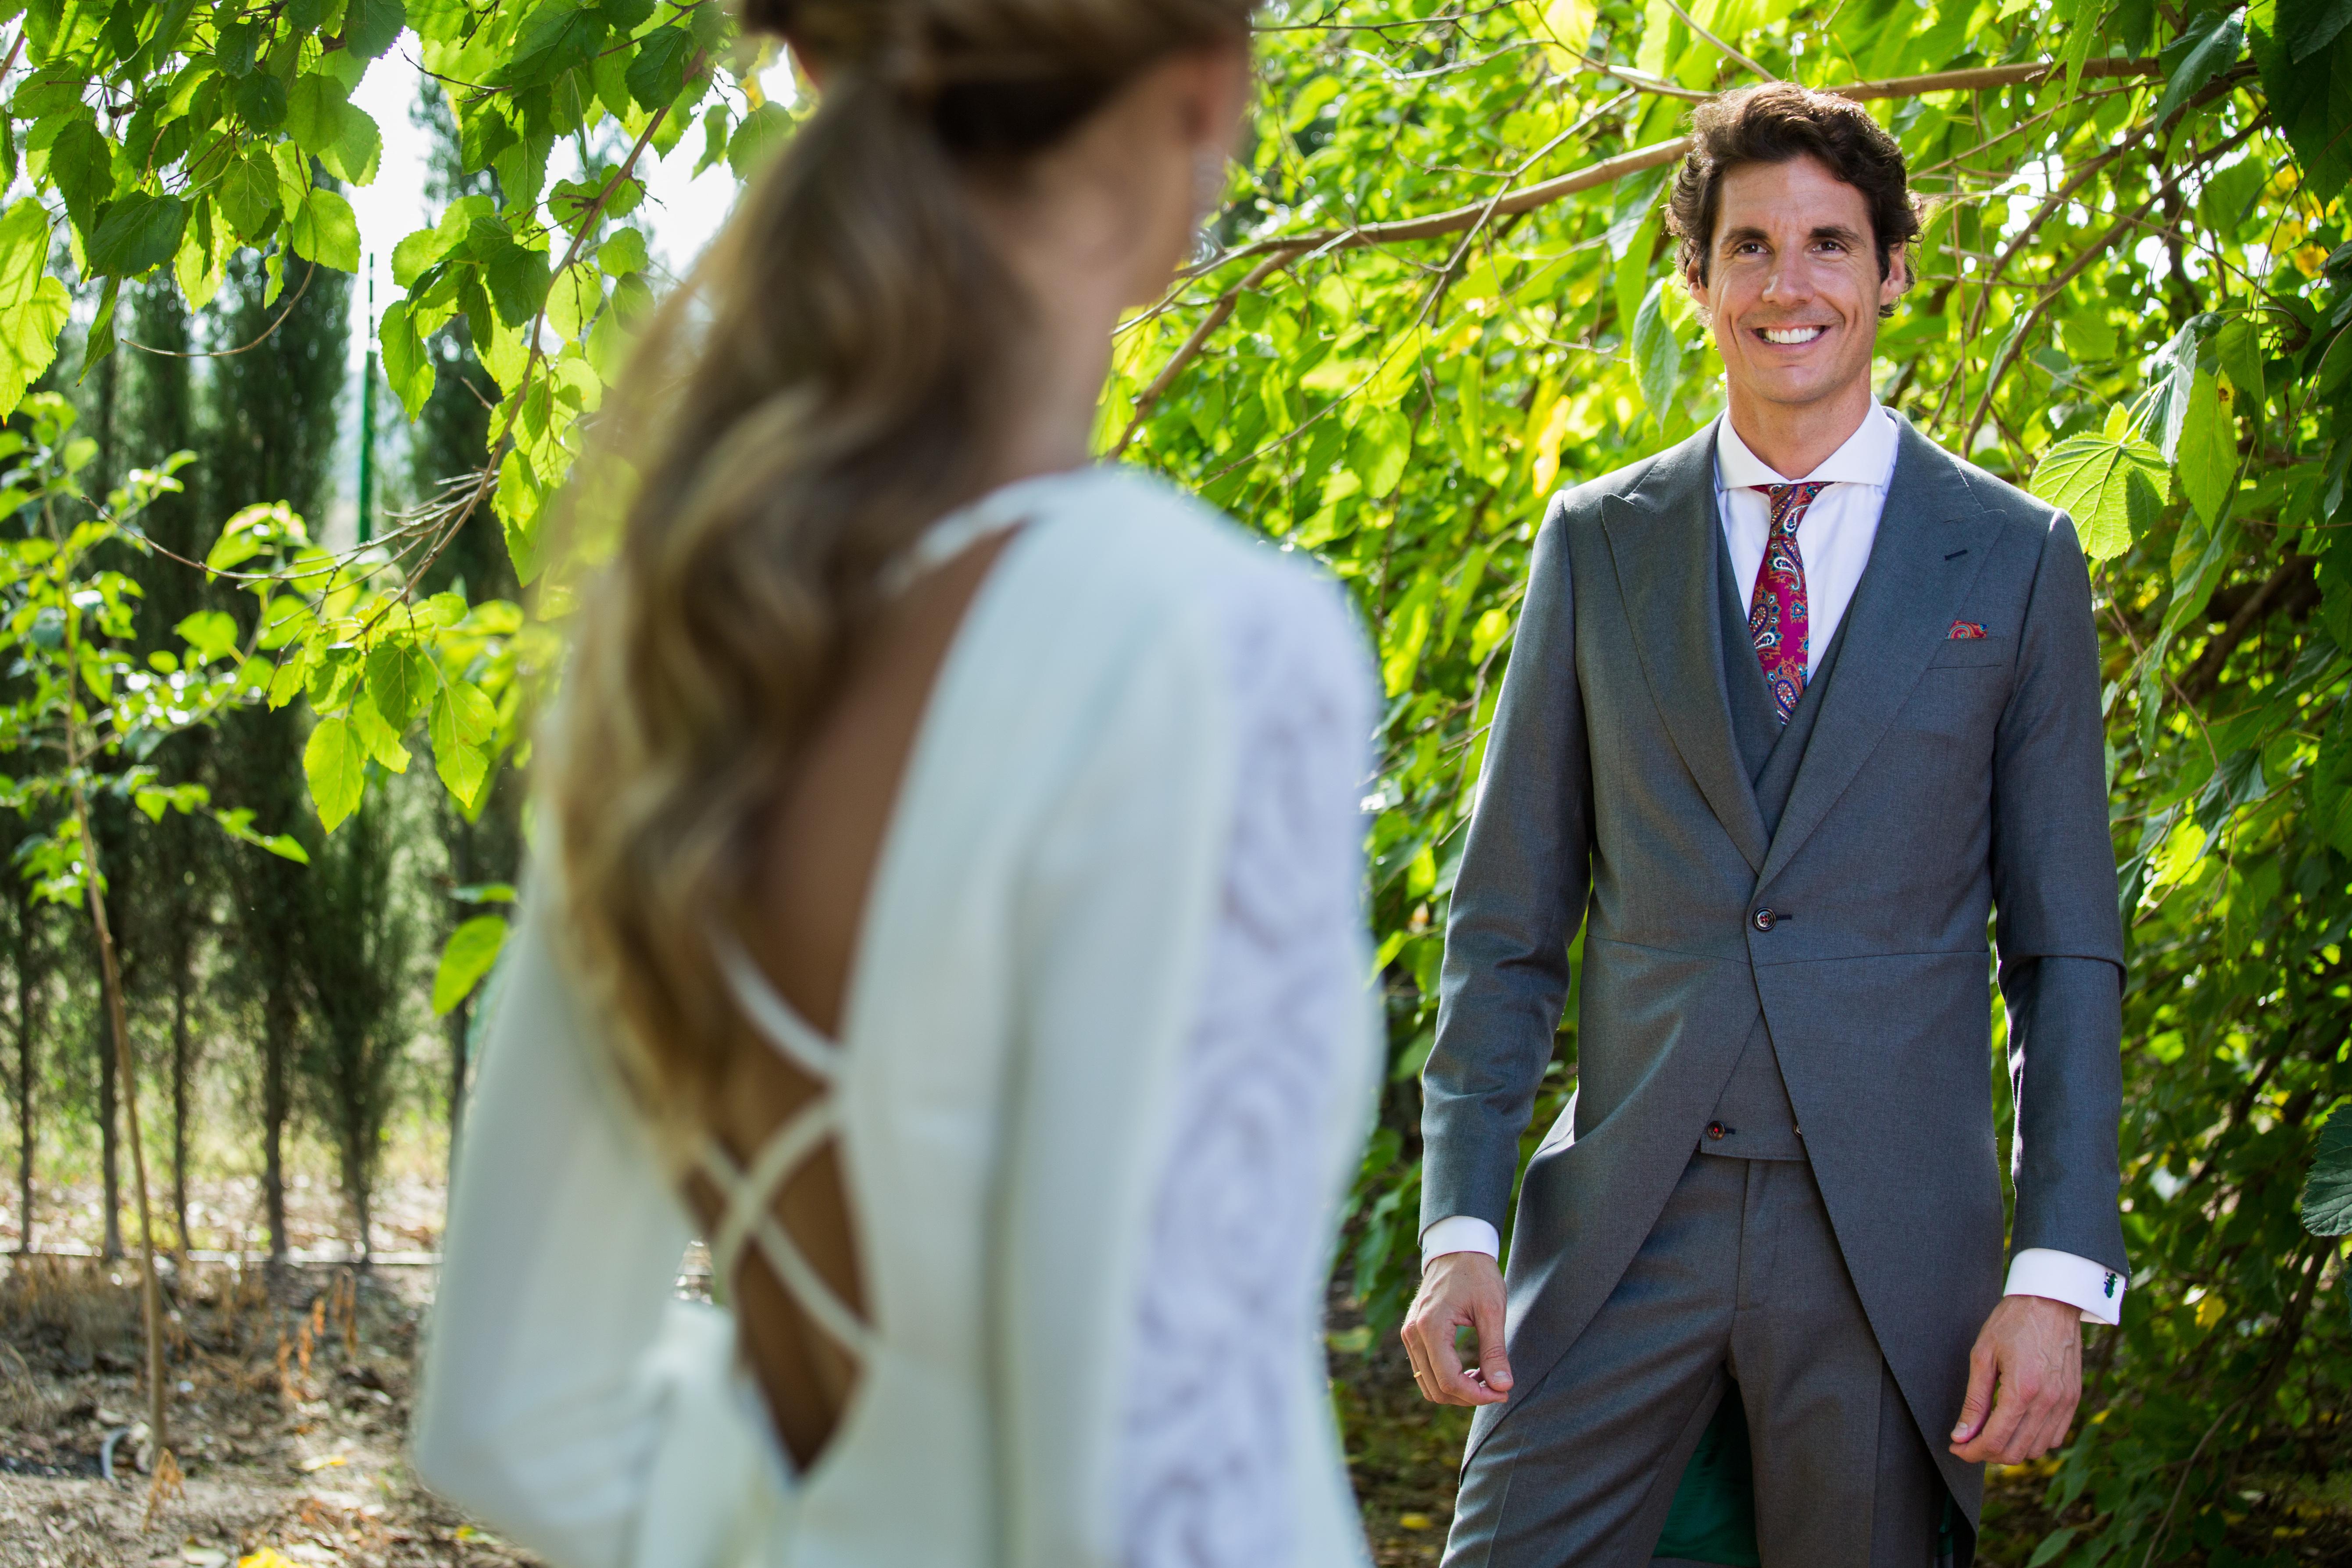 mandarina weddig, fotografos de boda, fotografo boda soria, fotografo boda barcelona, fotografo boda Madrid, fotografo boda lerida, fotografo boda Huesca_27